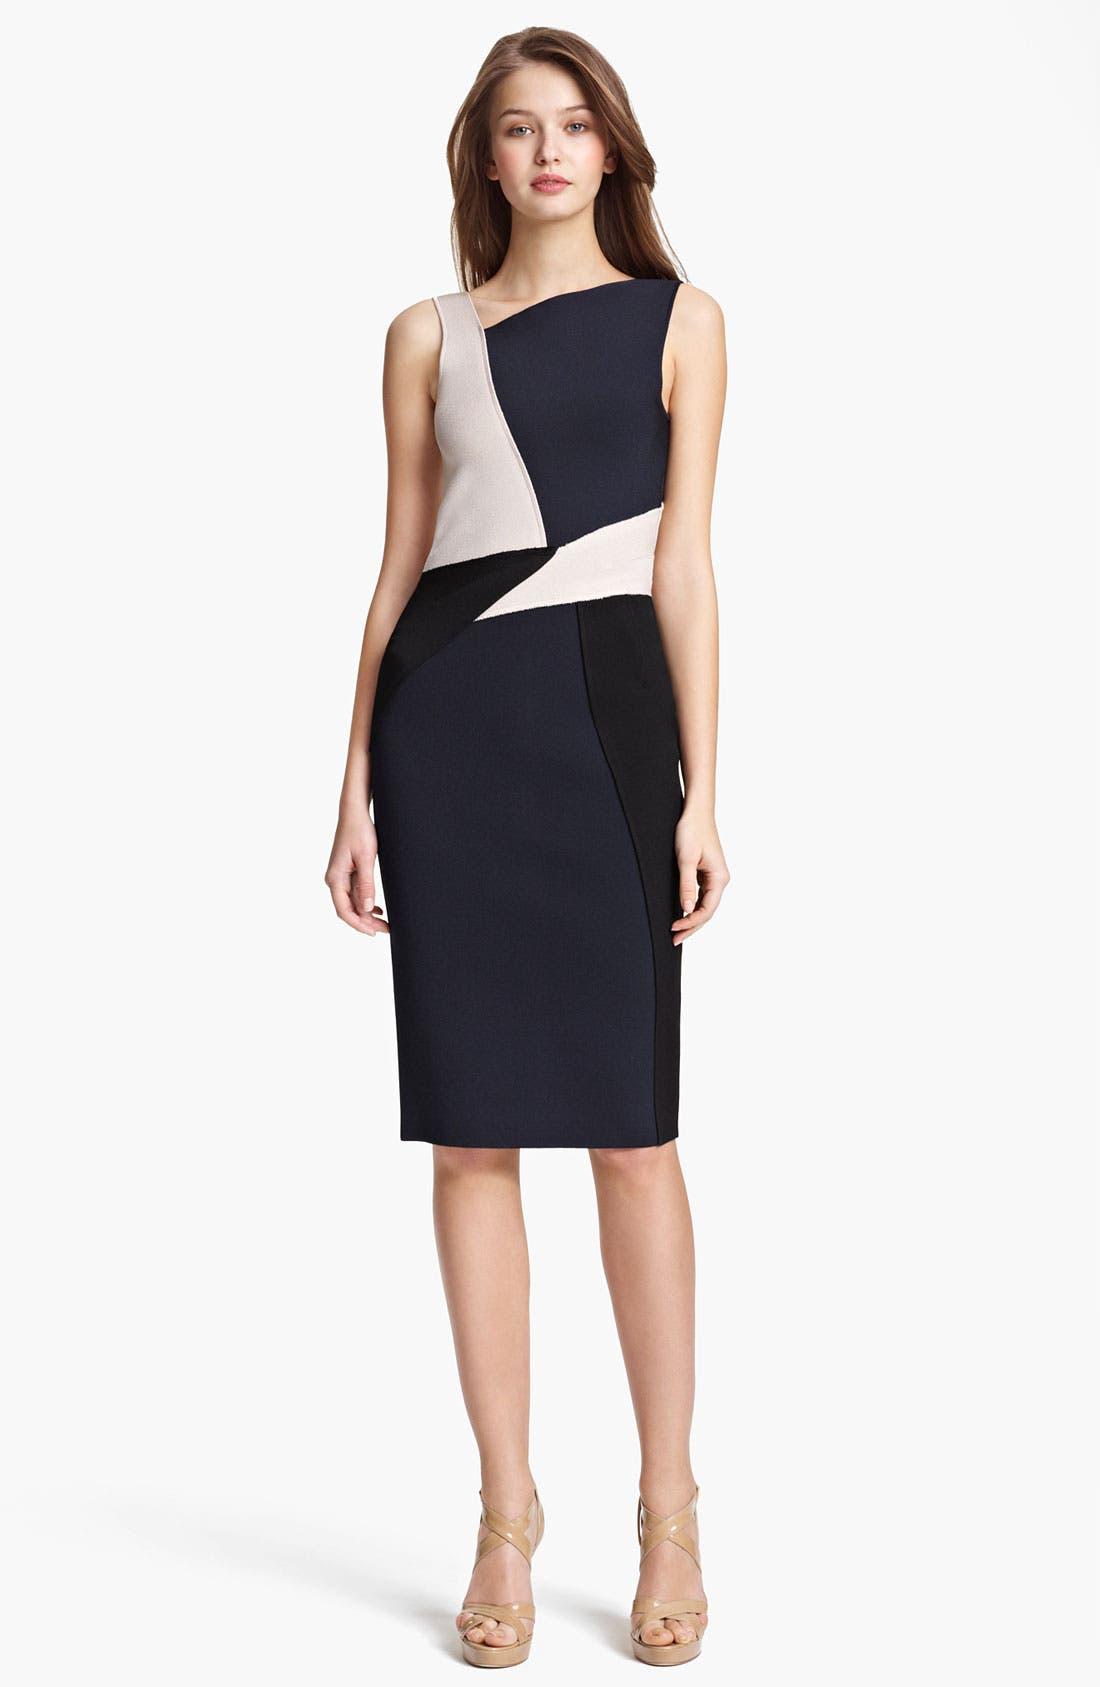 Main Image - Oscar de la Renta Colorblock Knit Dress